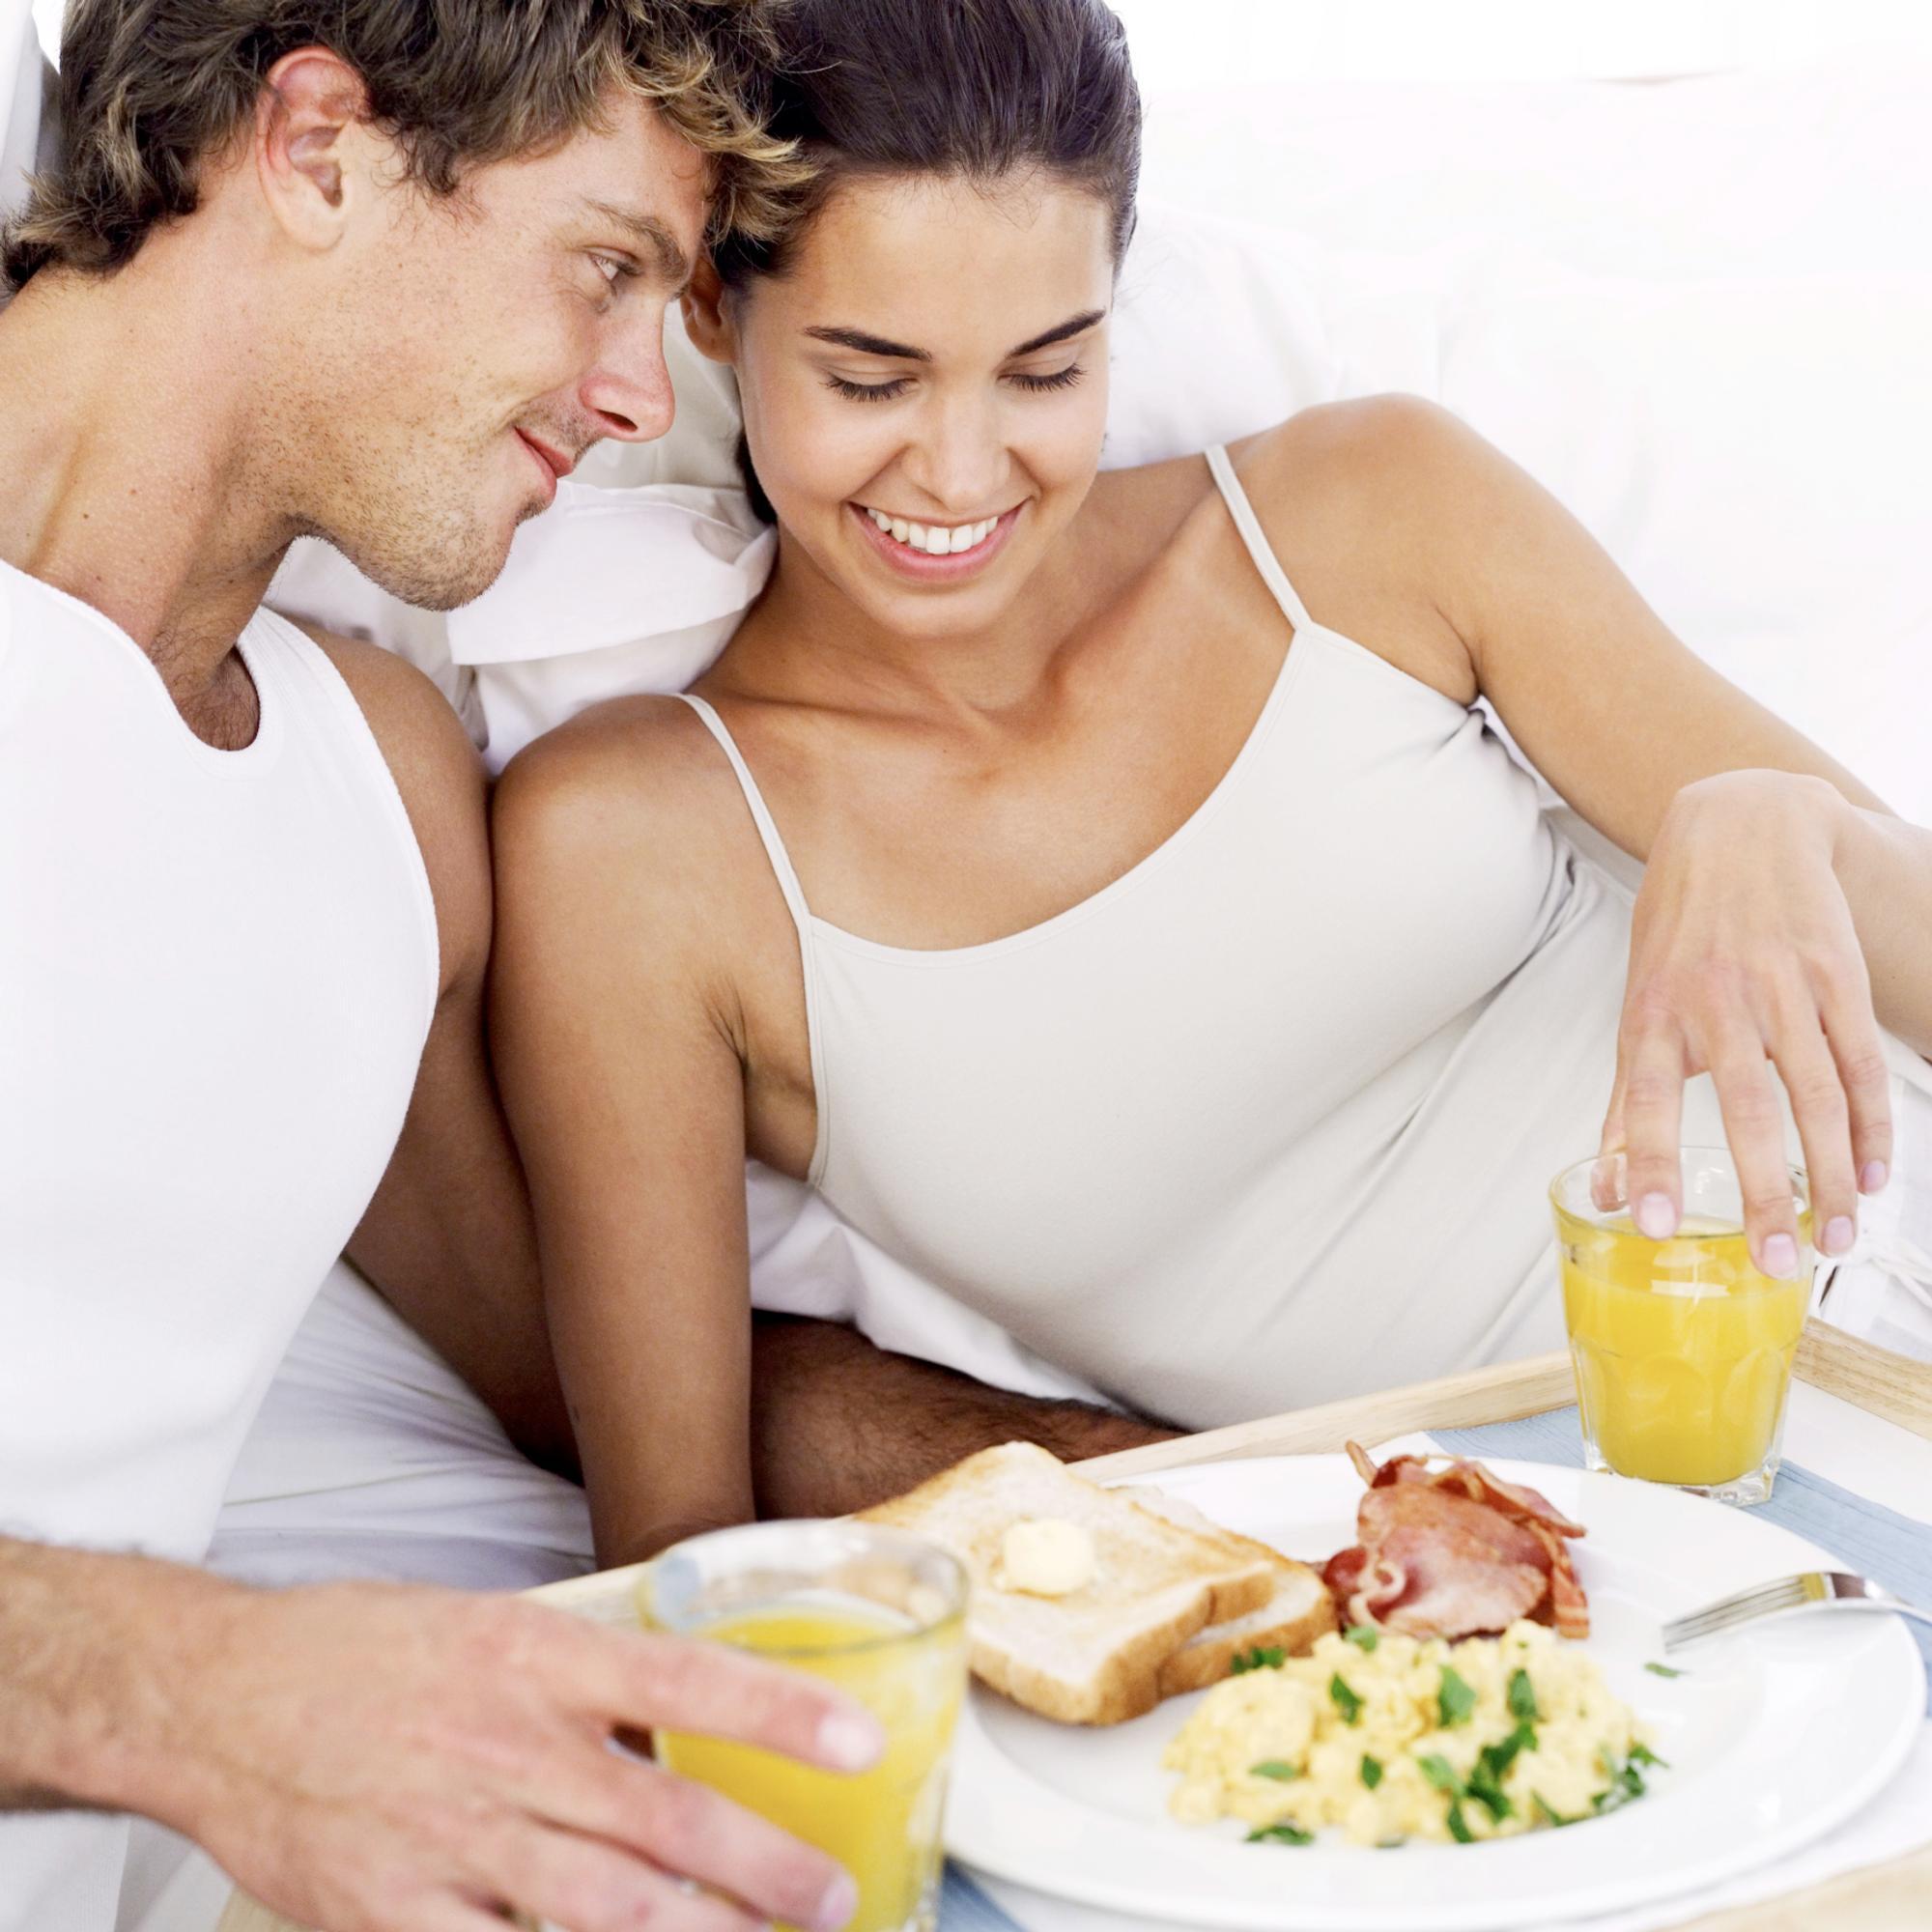 hereillä dating mainos